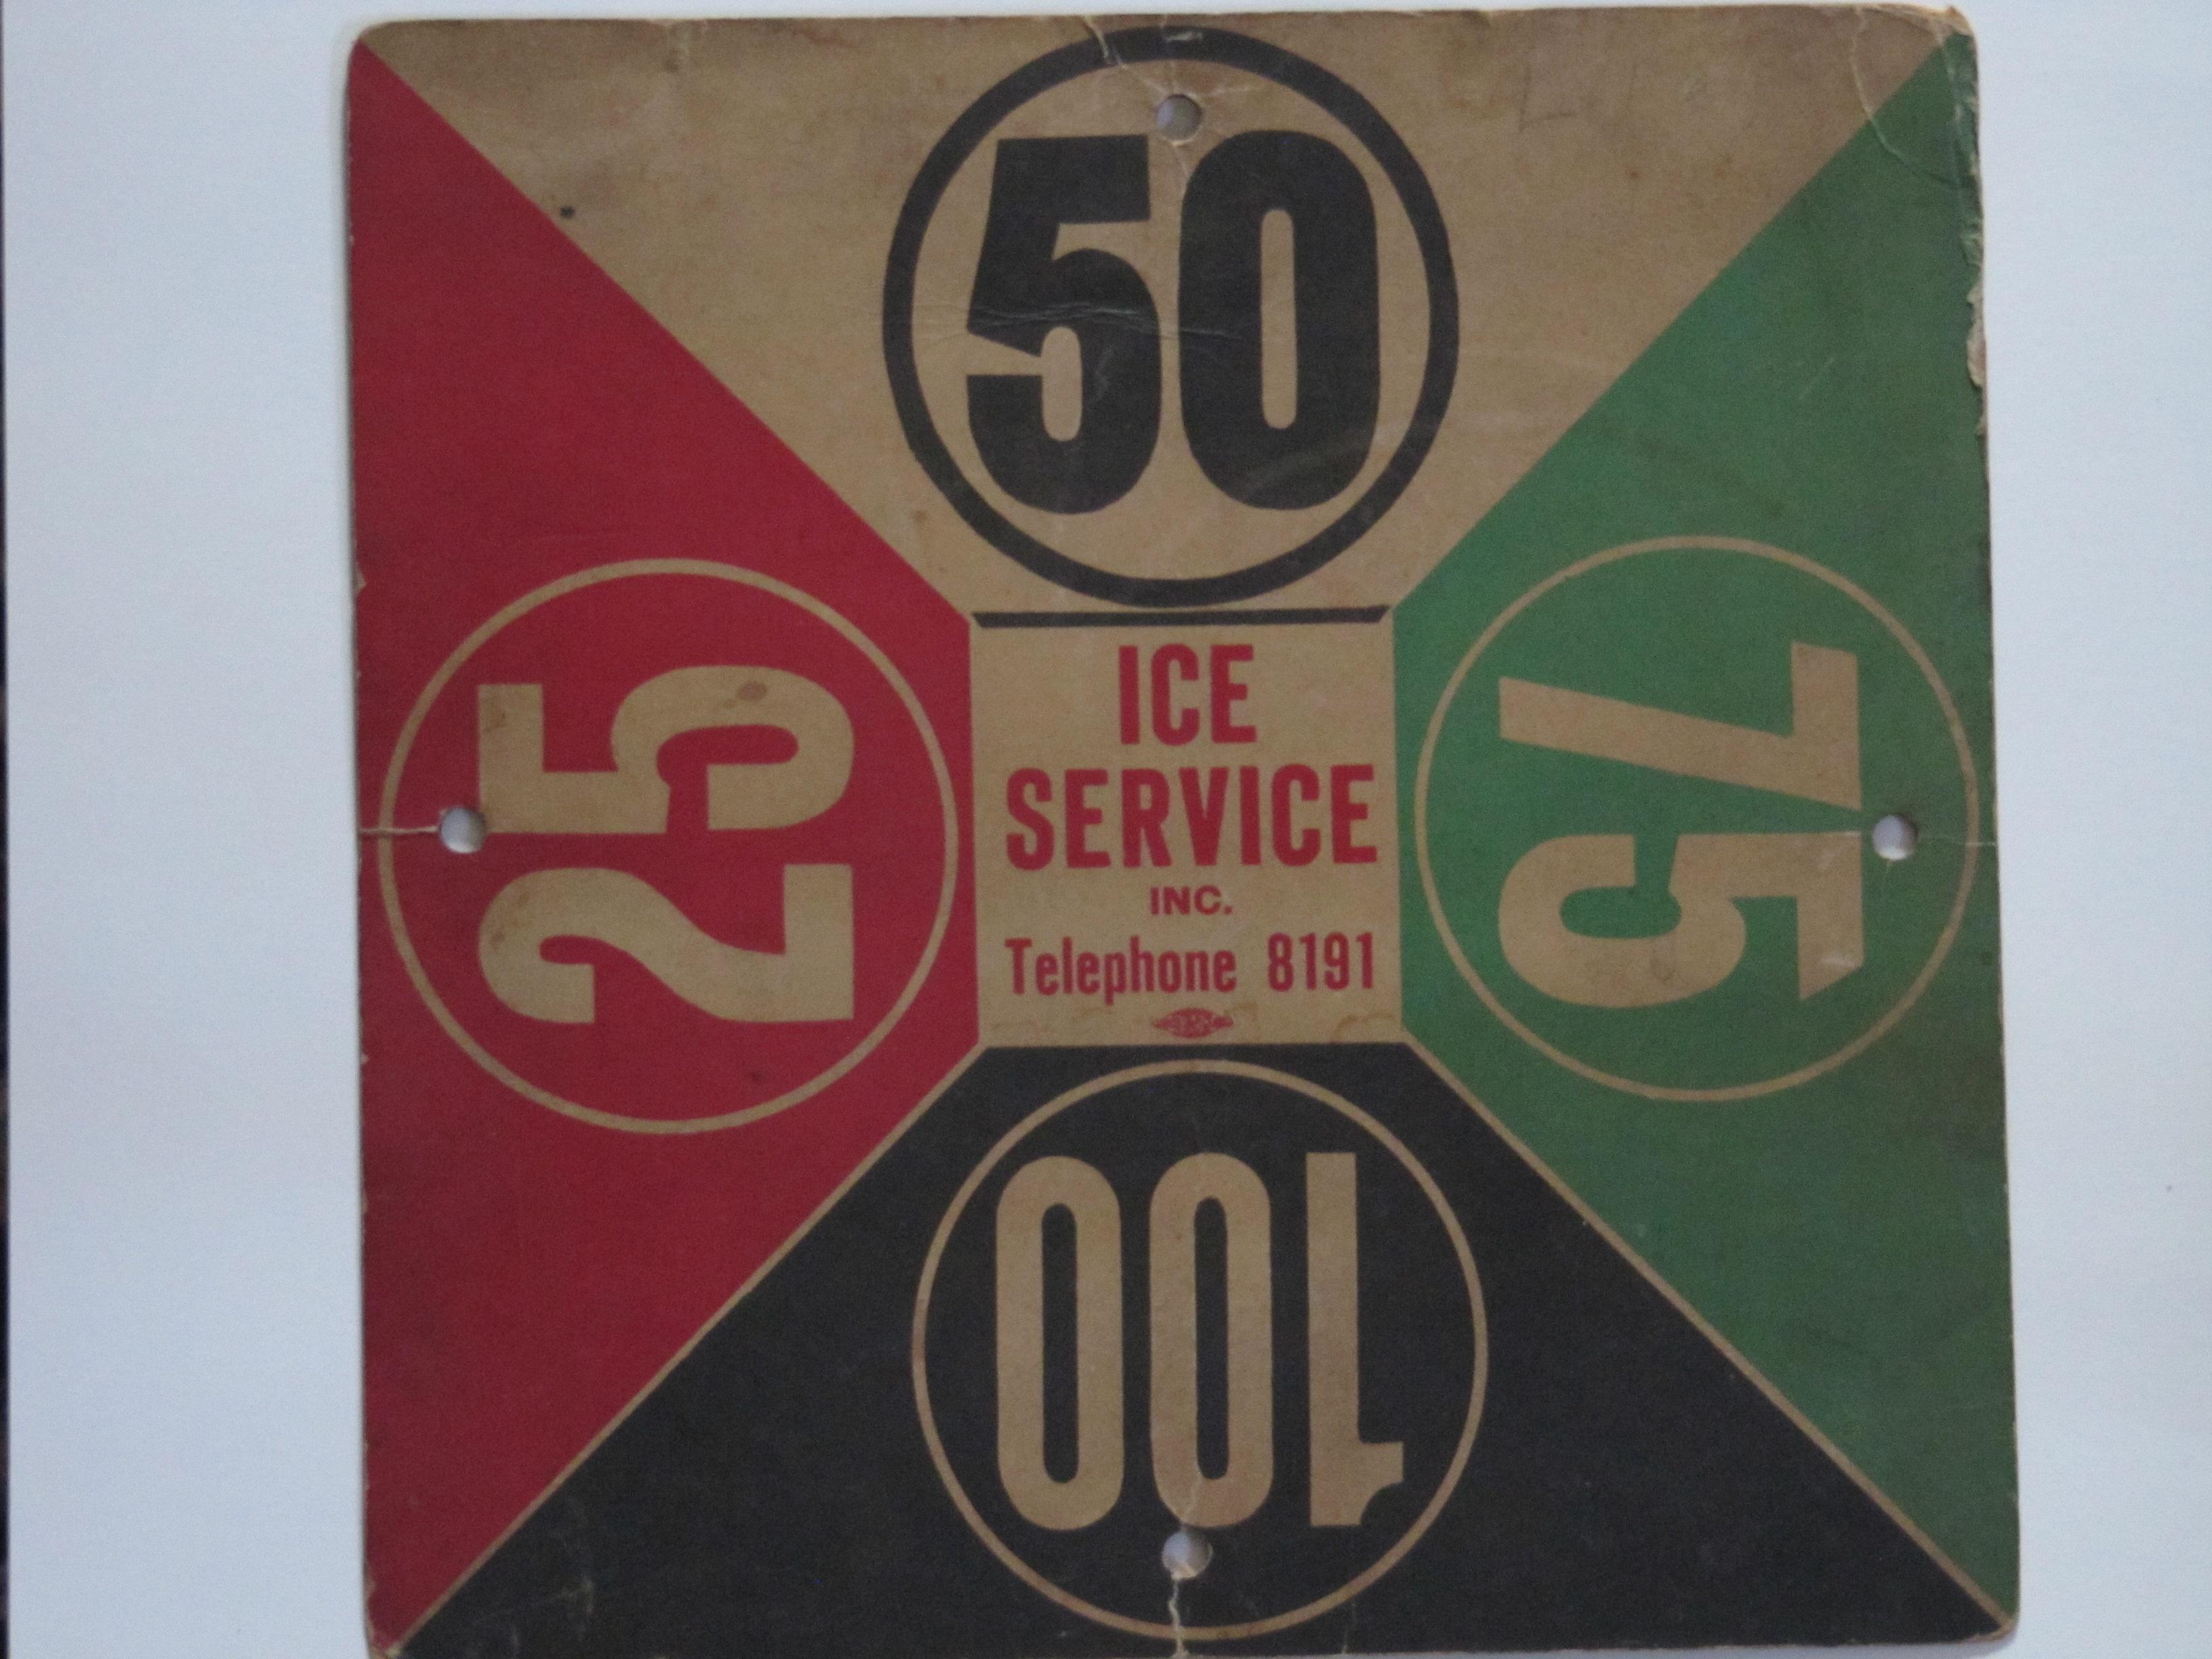 Ice Service Inc.